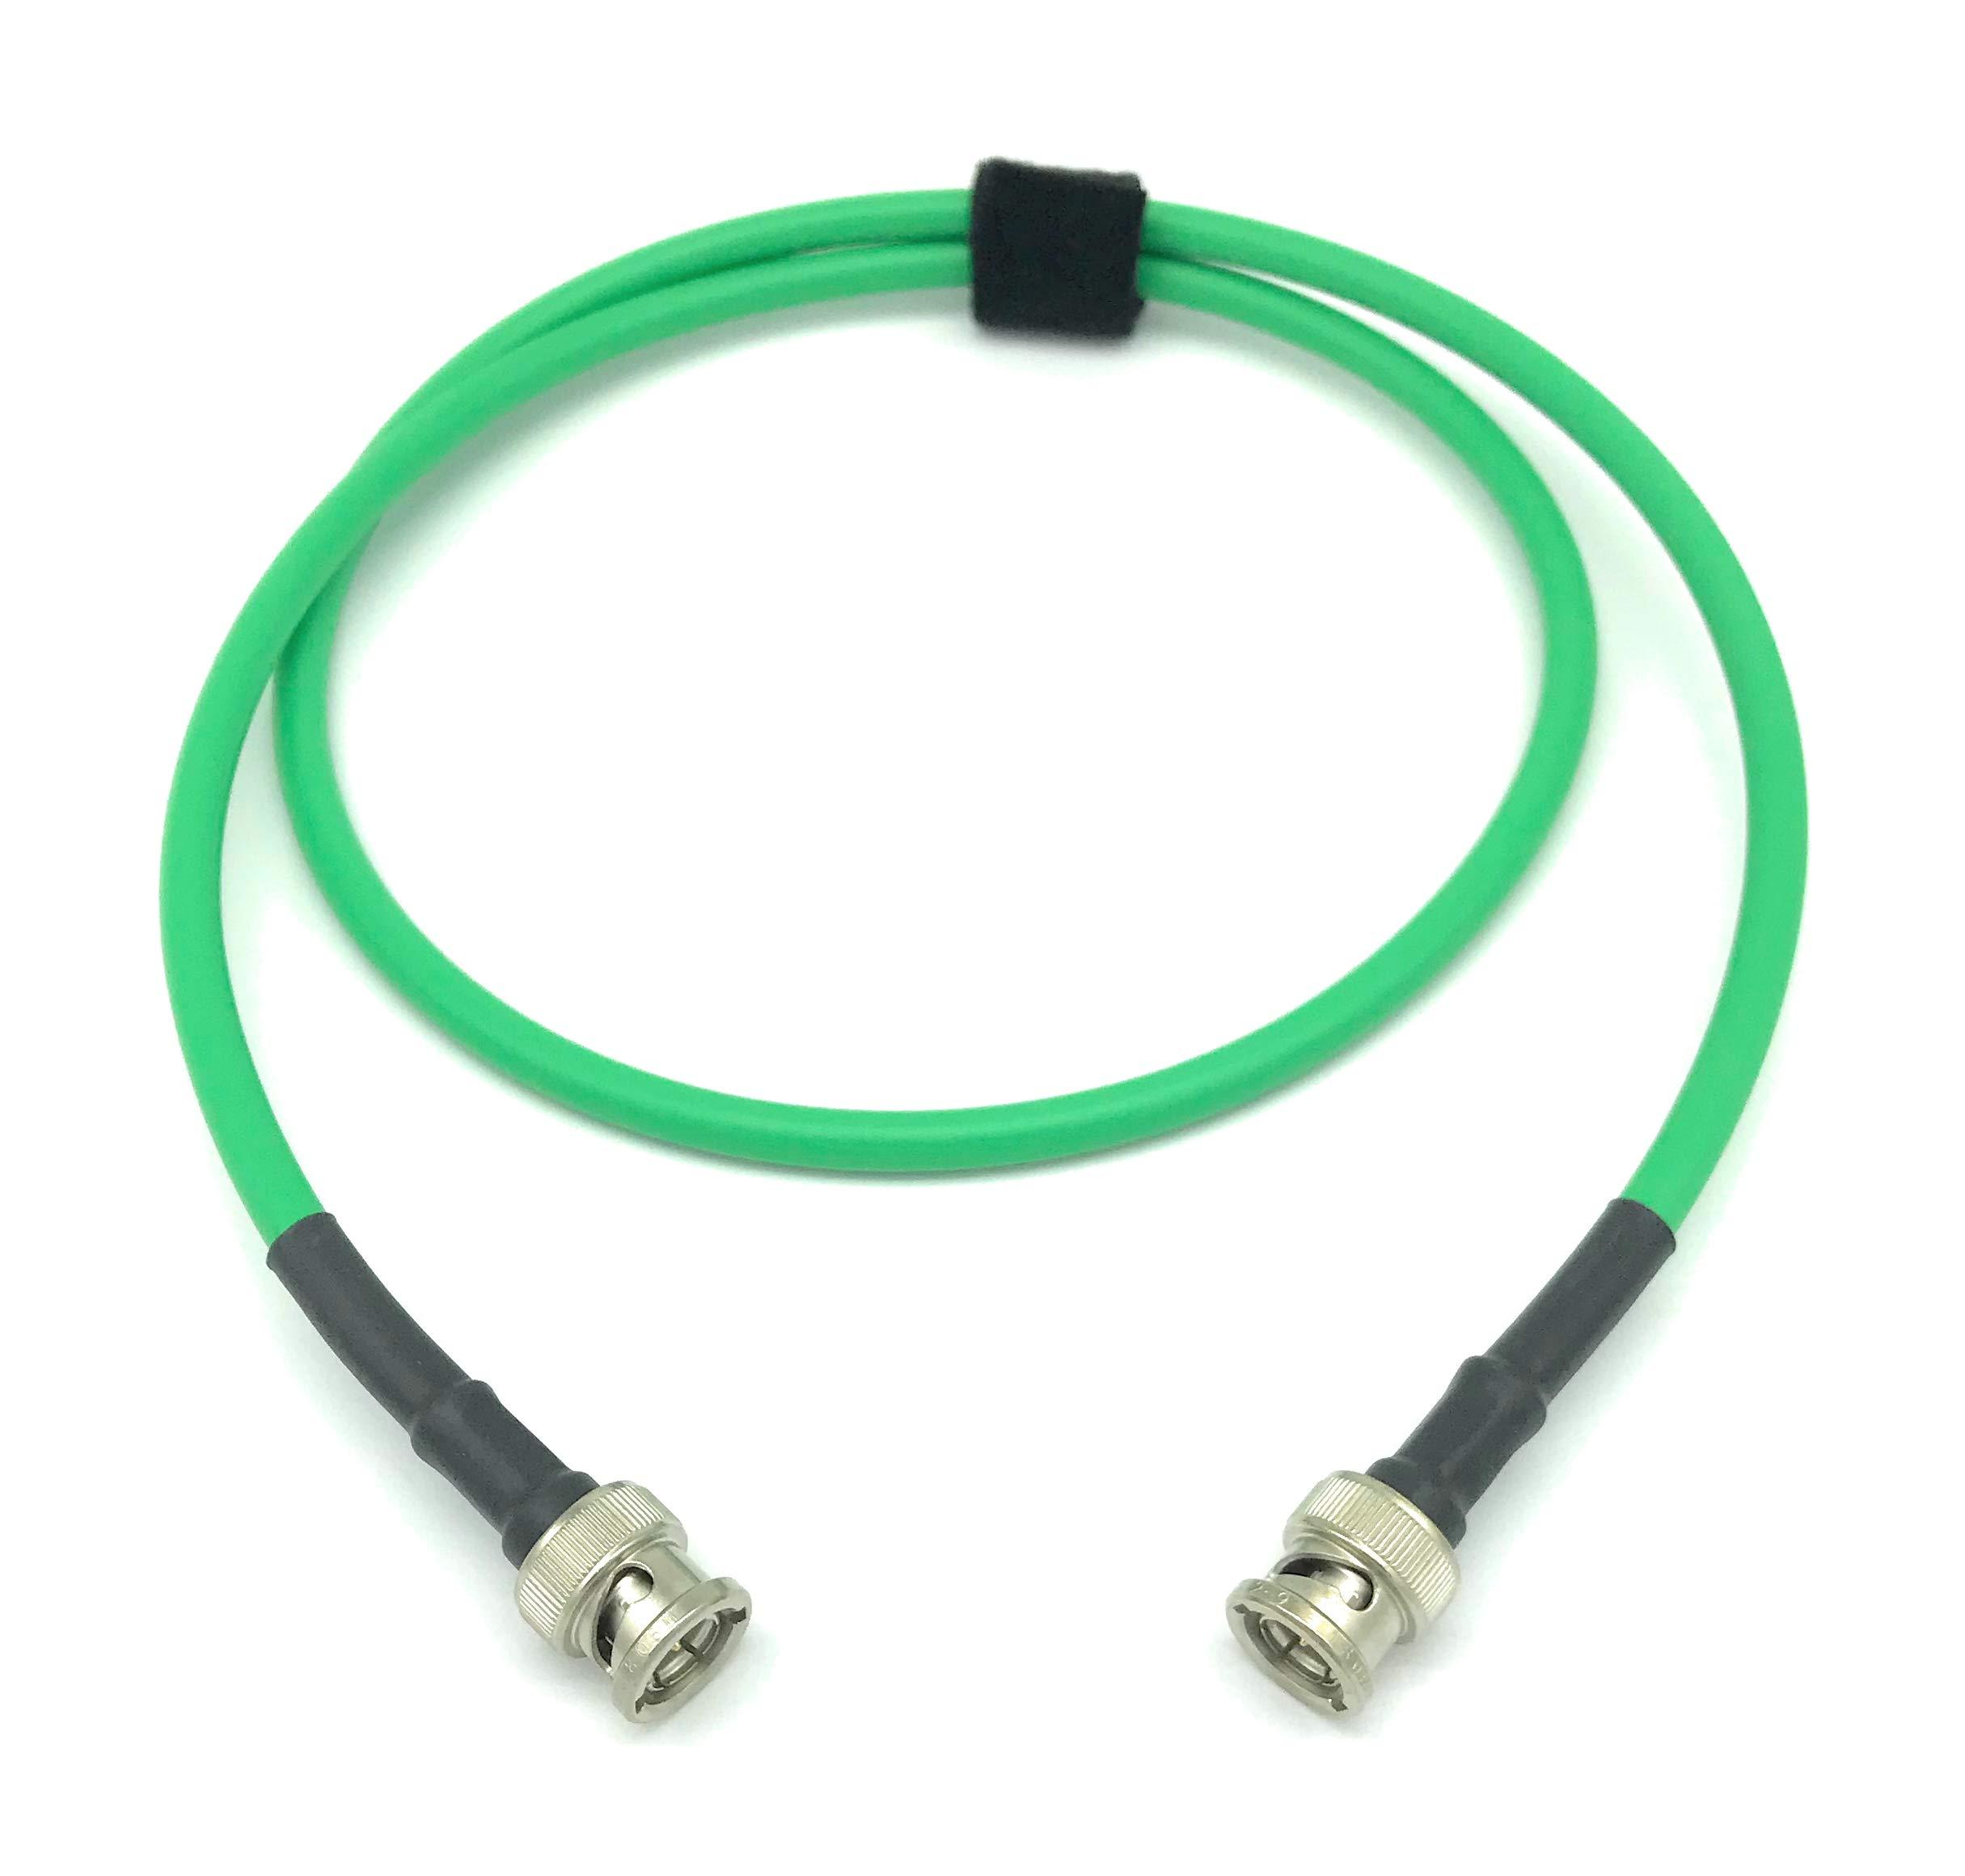 100ft AV-Cables 3G/6G HD SDI BNC Cable Belden 1505A RG59 - Green